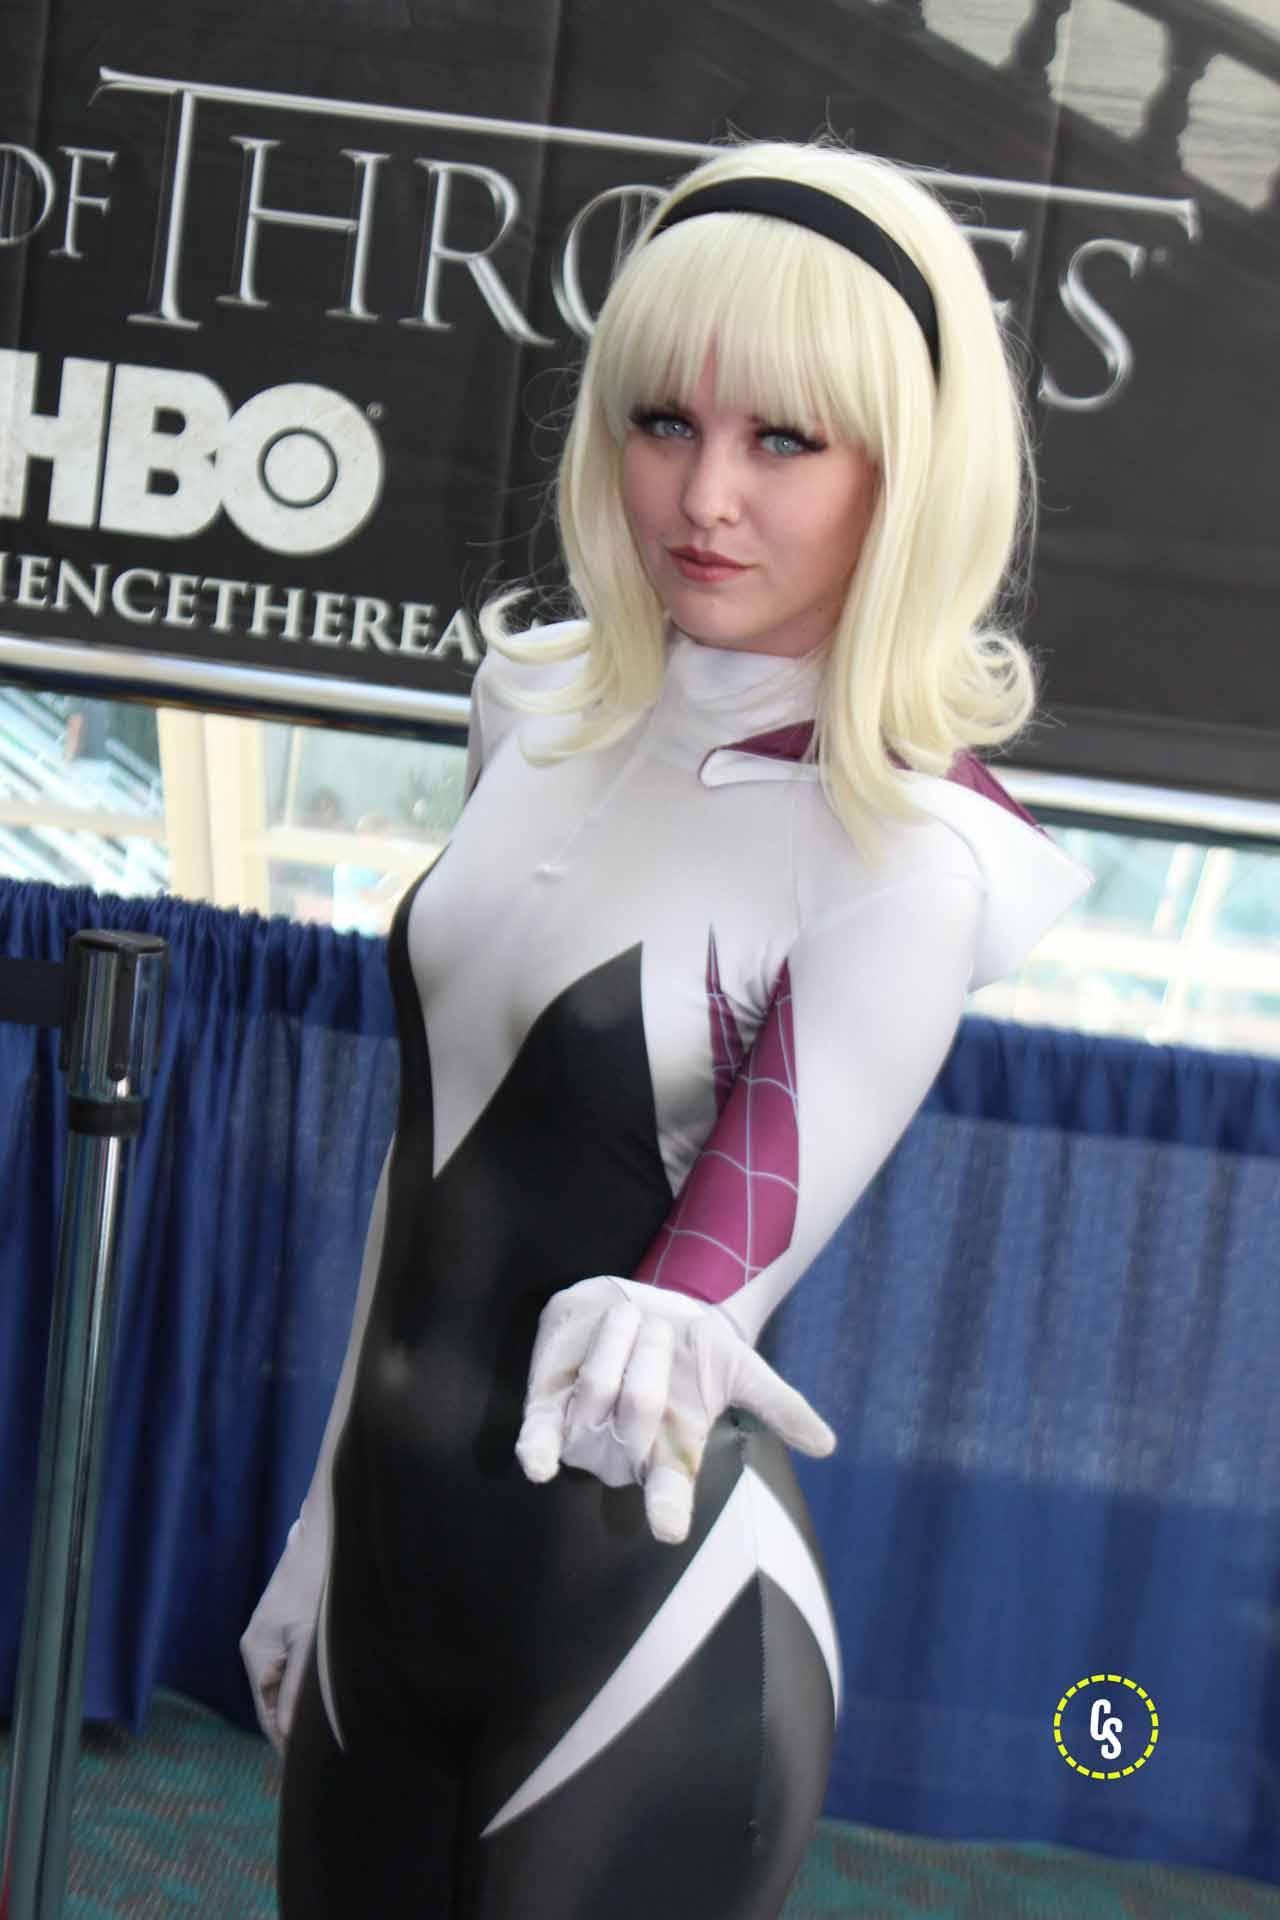 http://cdn1-www.superherohype.com/assets/uploads/gallery/comic-con-2015-cosplay-photos-3/cosplayroundthree0028.jpg